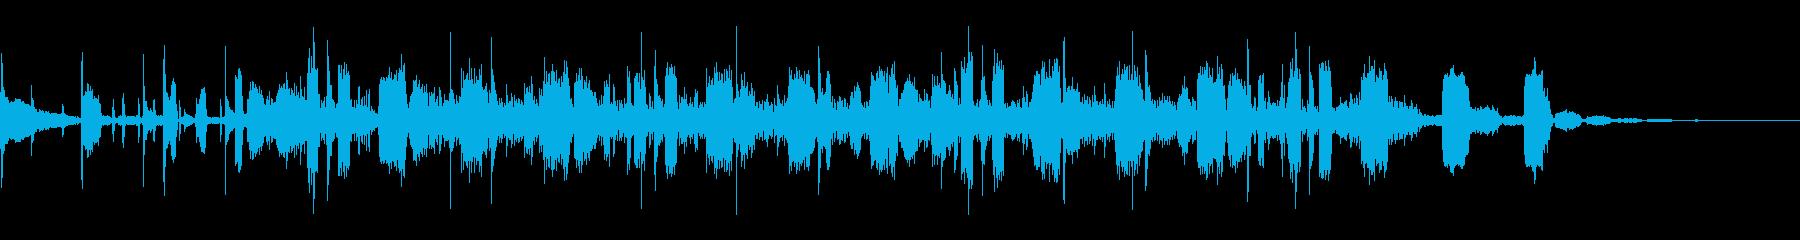 OP、ENDにも使える奇妙ビートボイス2の再生済みの波形